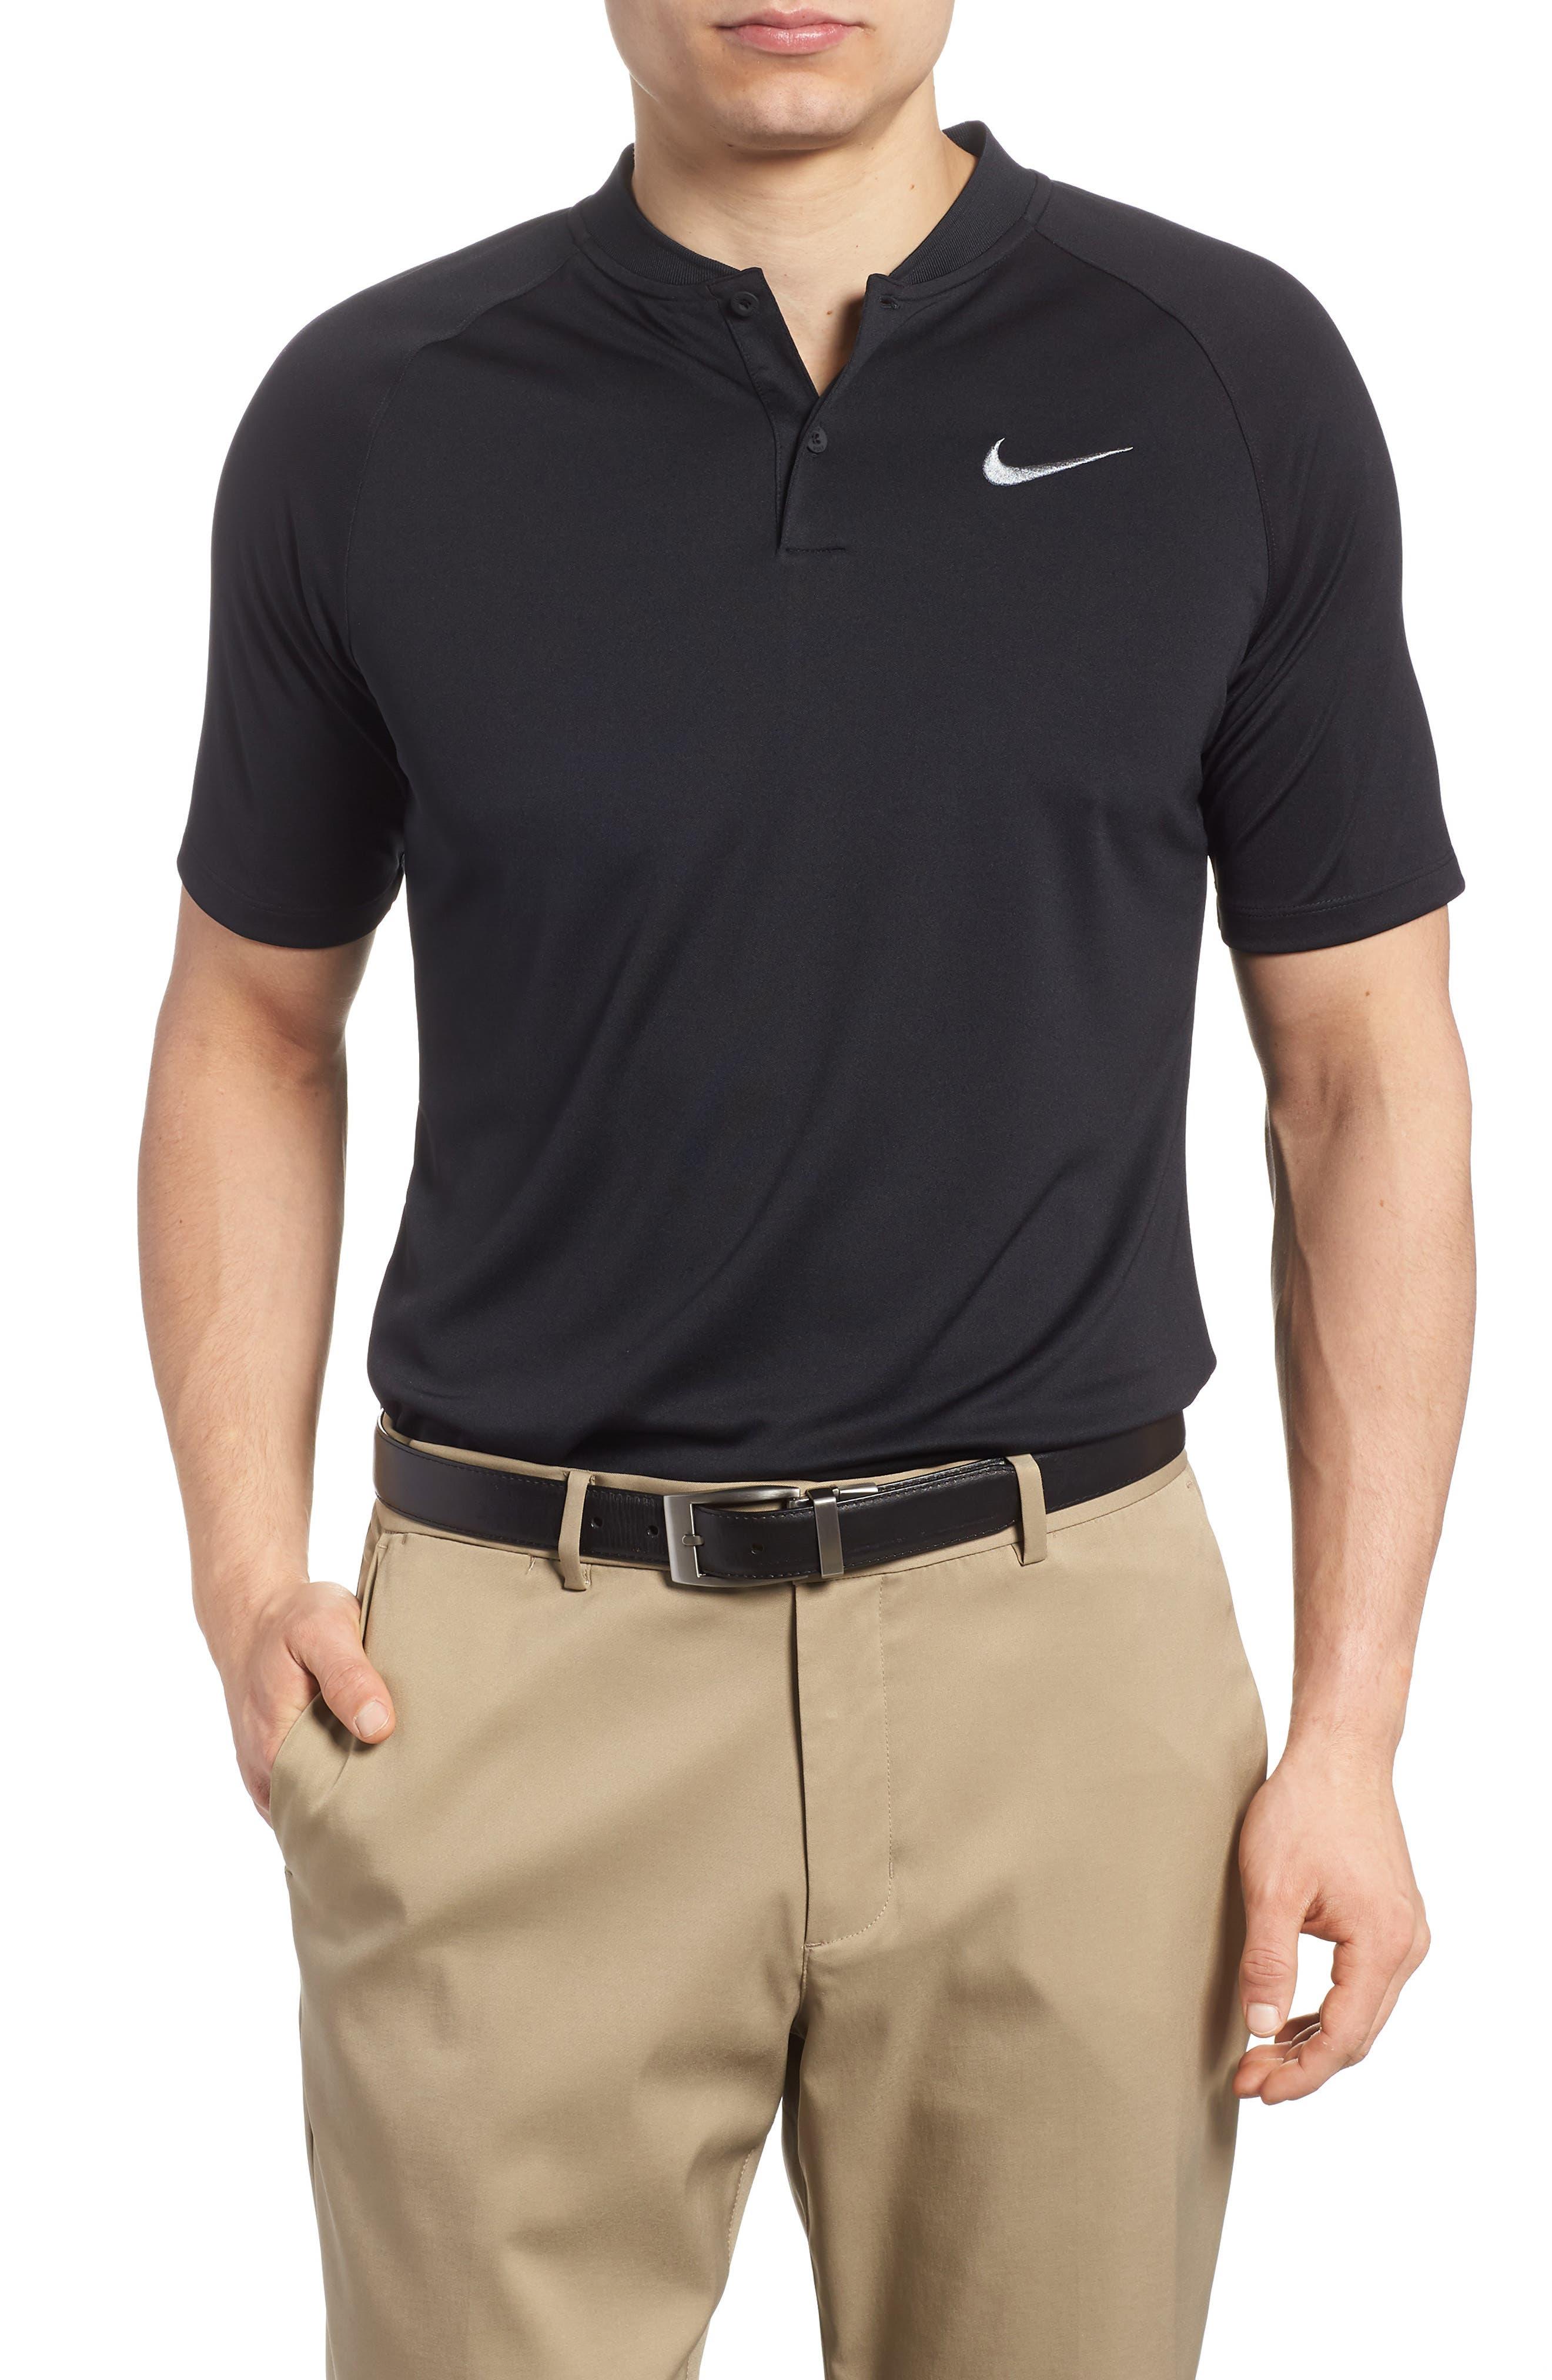 NIKE Momentum Dri-FIT Golf Polo, Main, color, BLACK/ BLACK/ GUNSMOKE